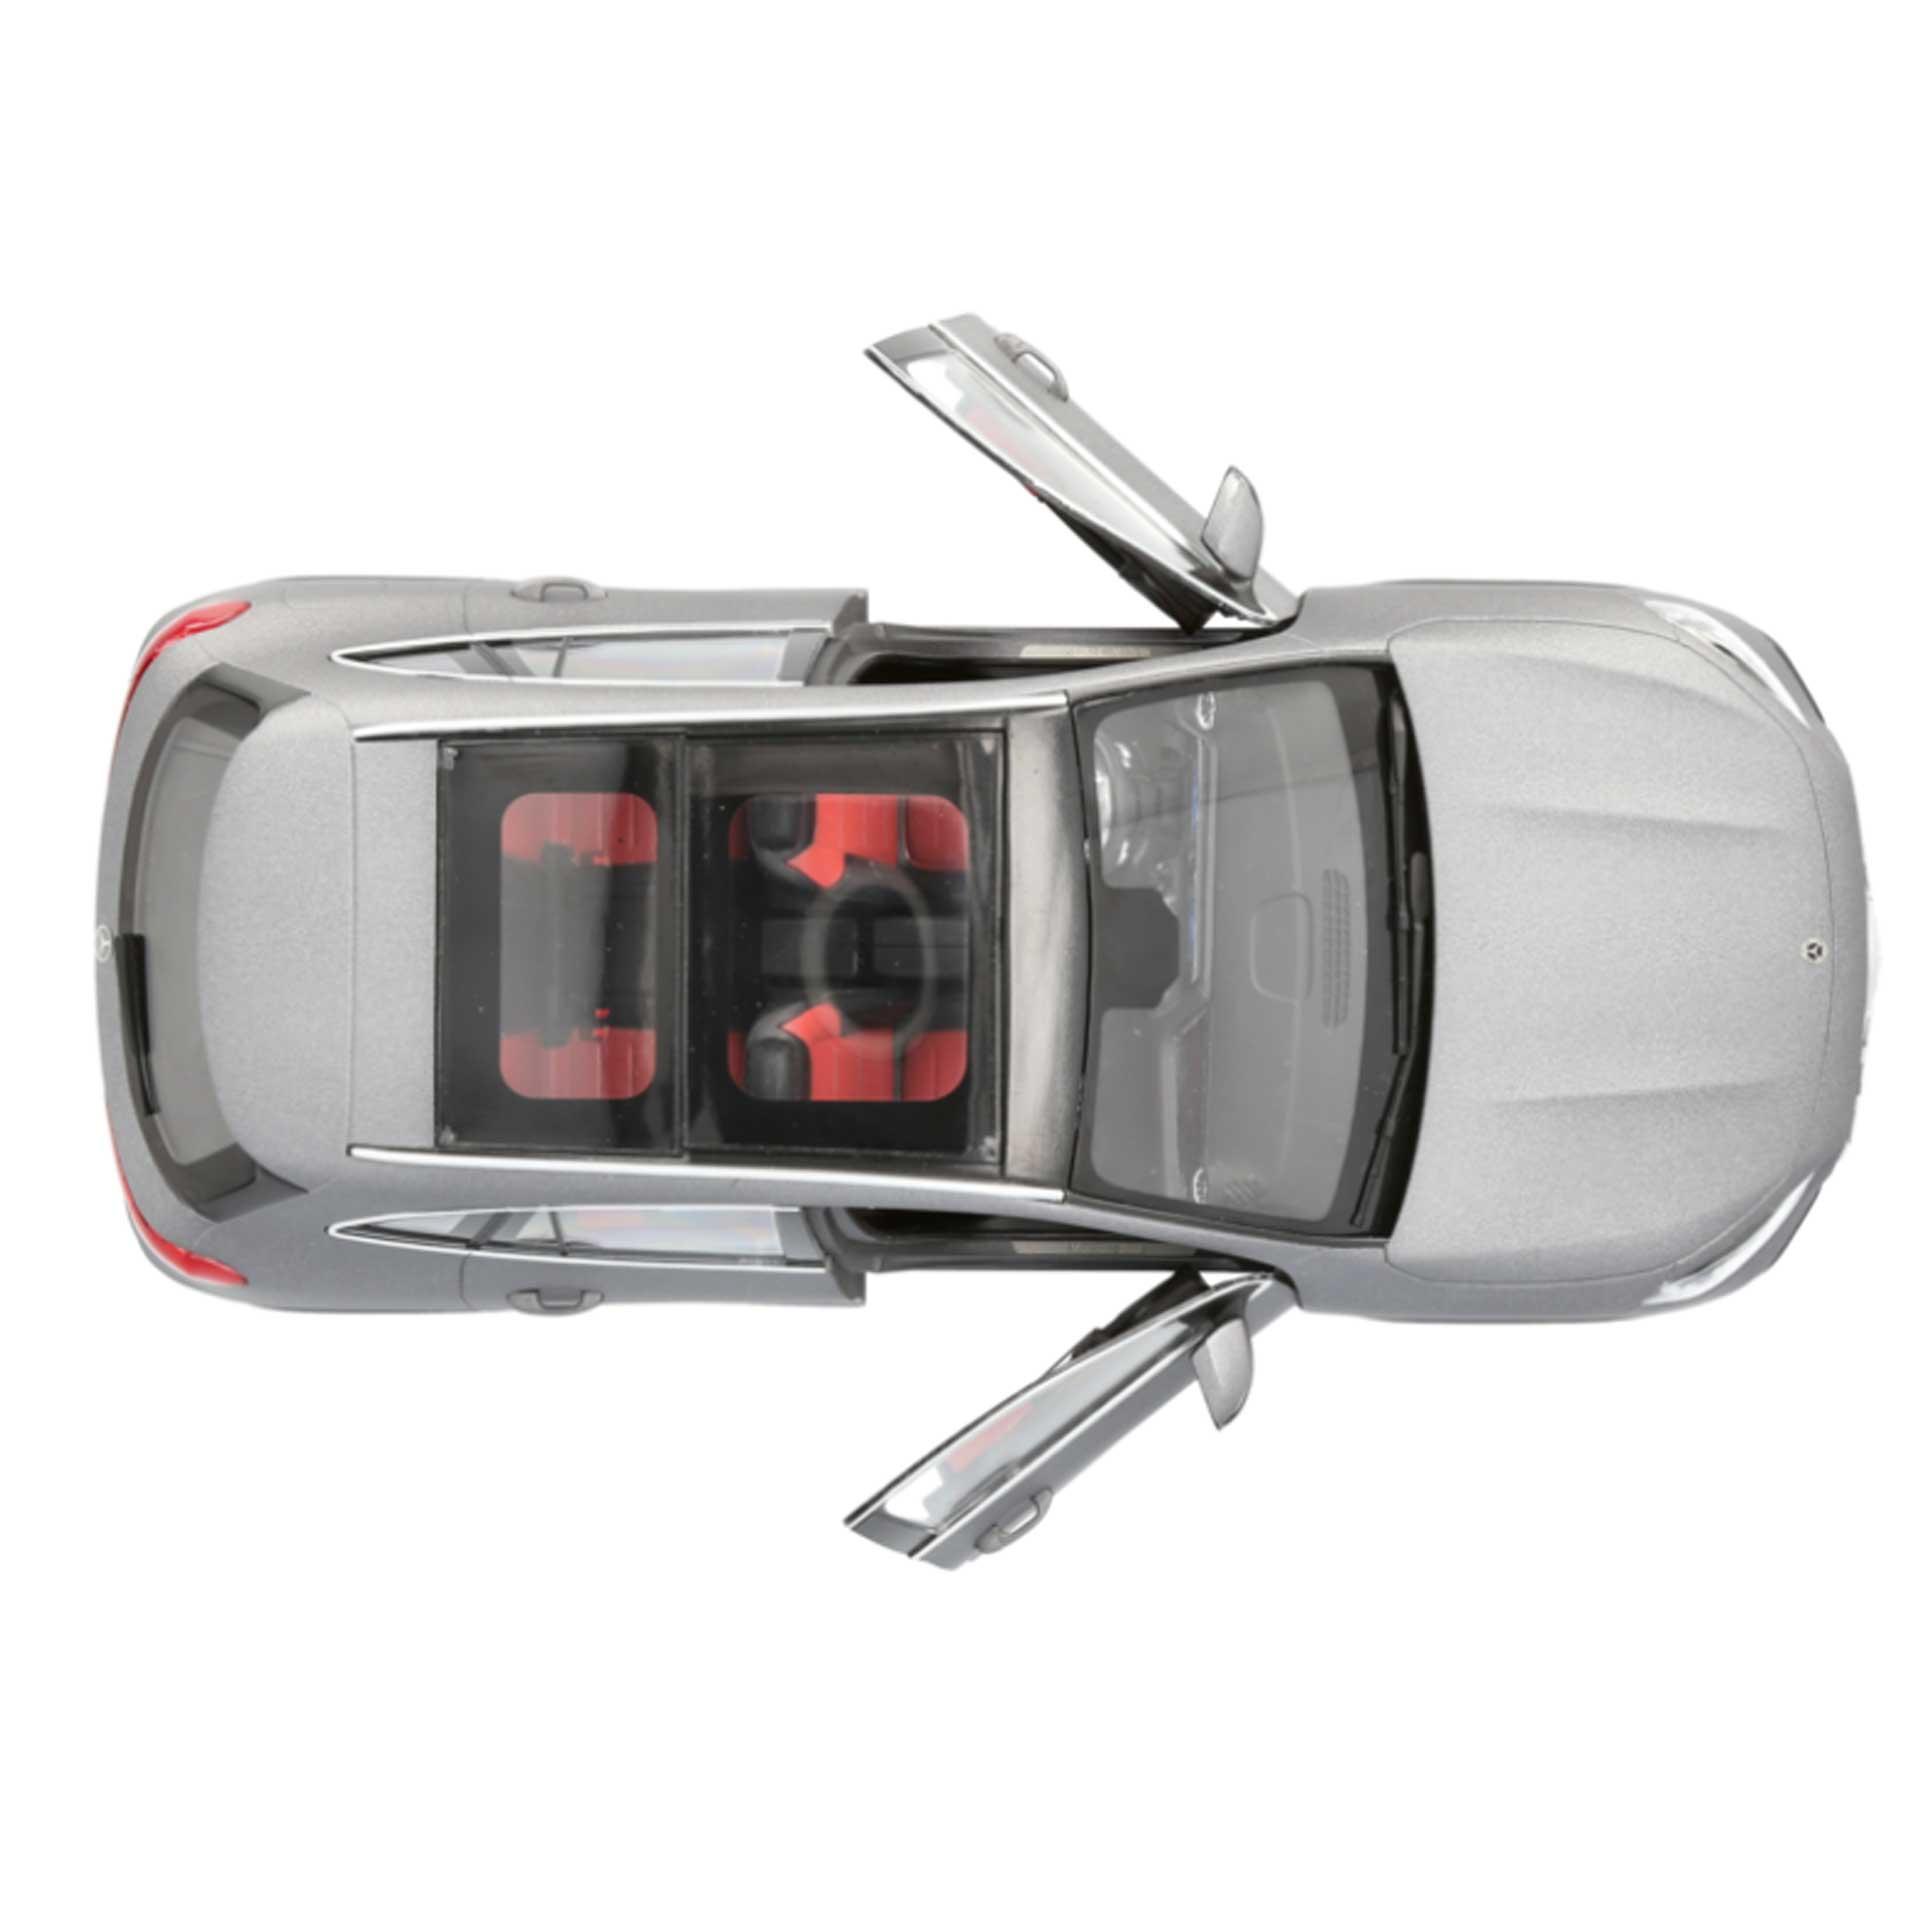 Mercedes-Benz GLA Modellauto H 247 1:18 designo mountaingrau magno